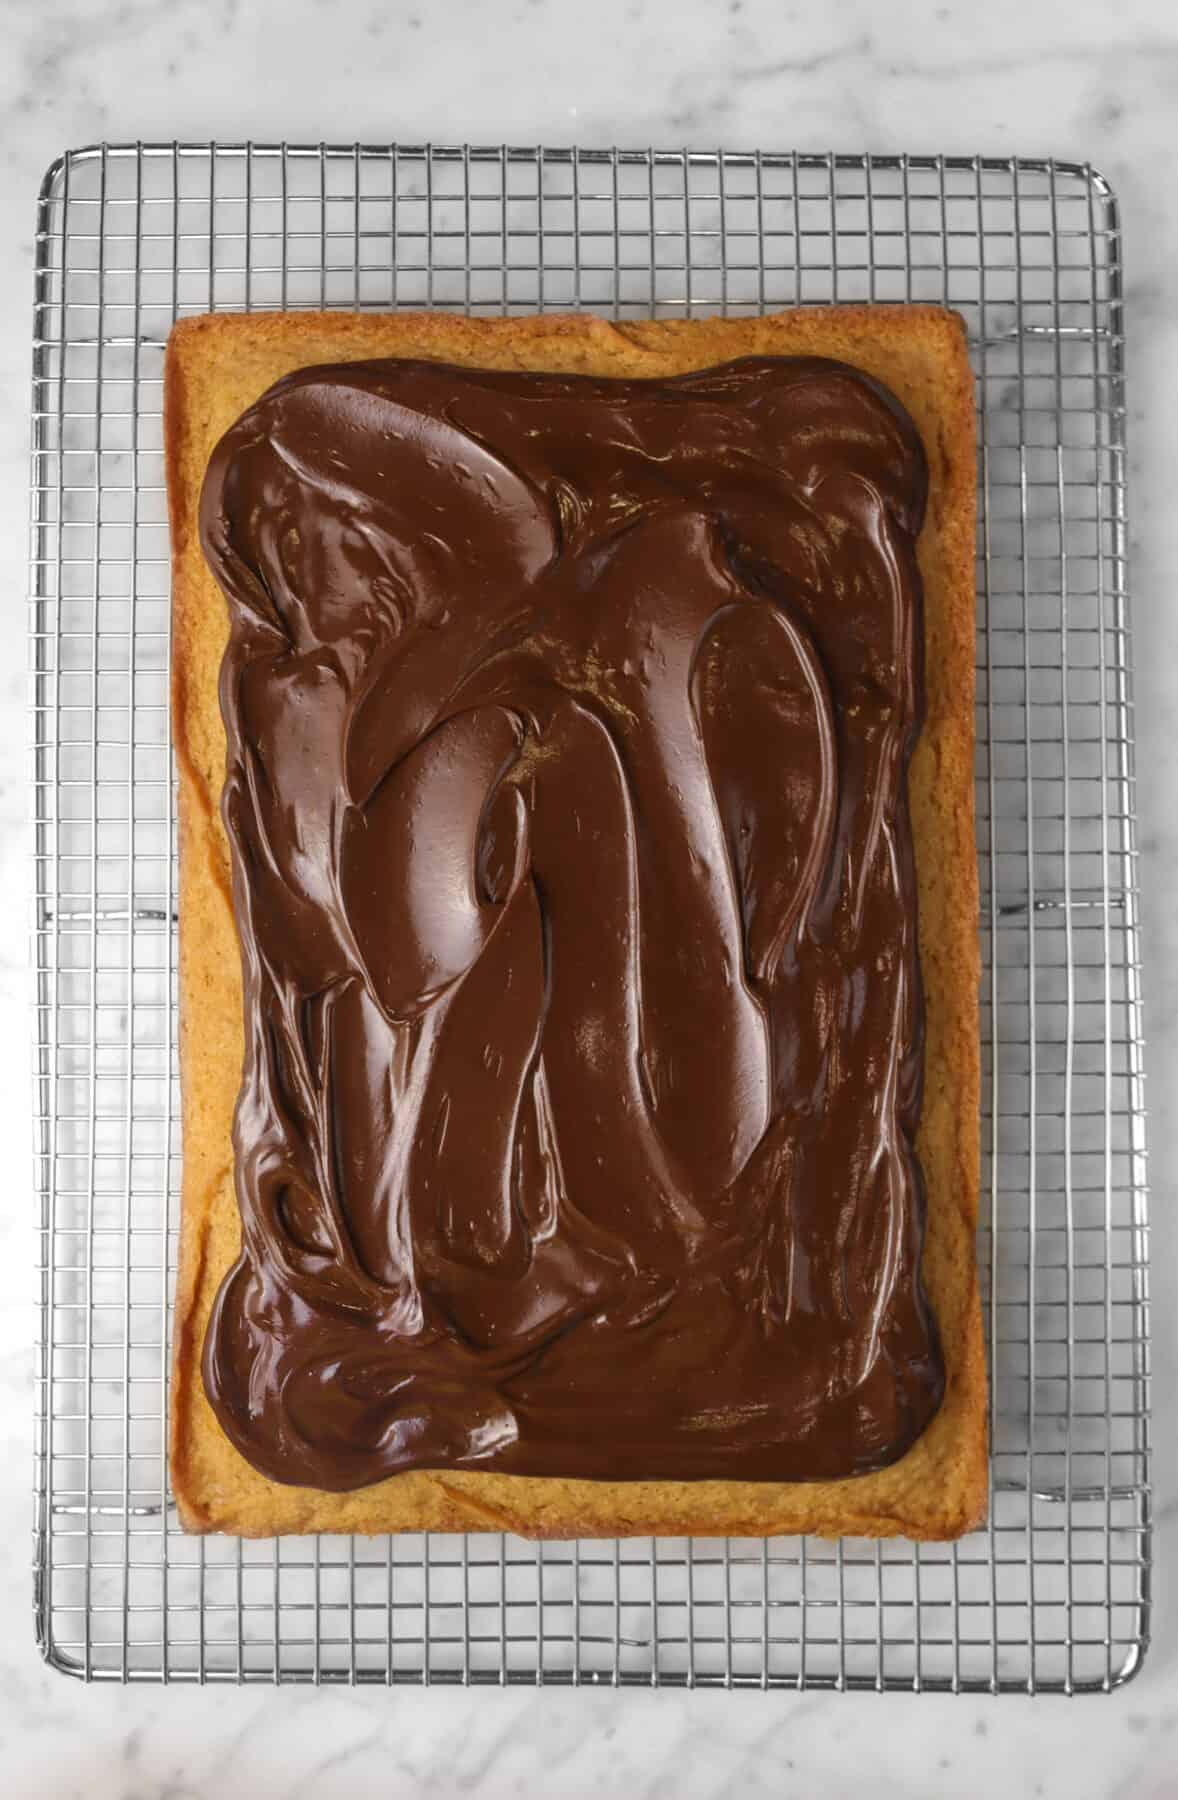 chocolate ganache spread onto cinnamon cake